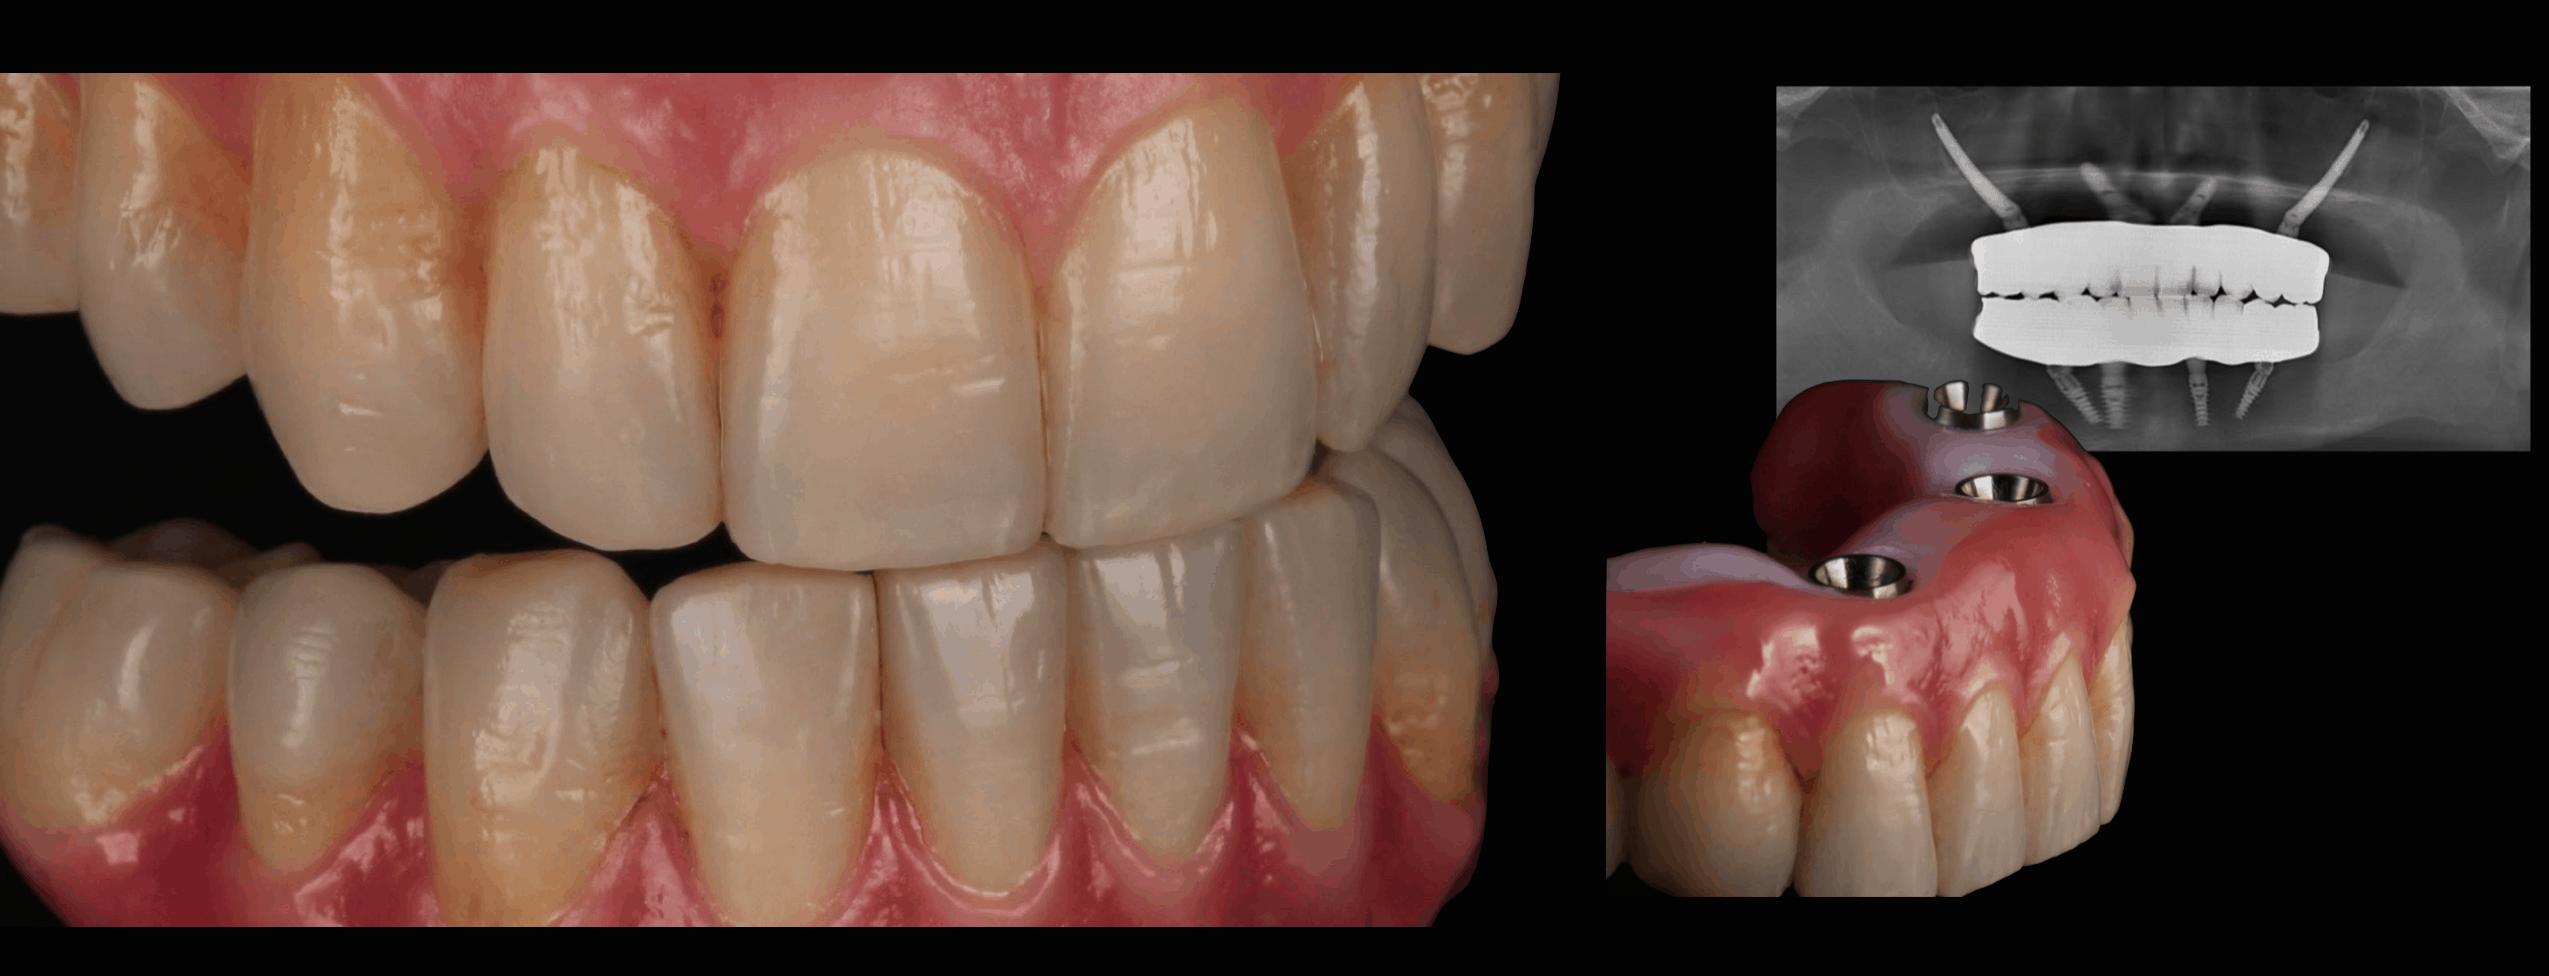 ArtLab Dentistry - xrays of Ferna